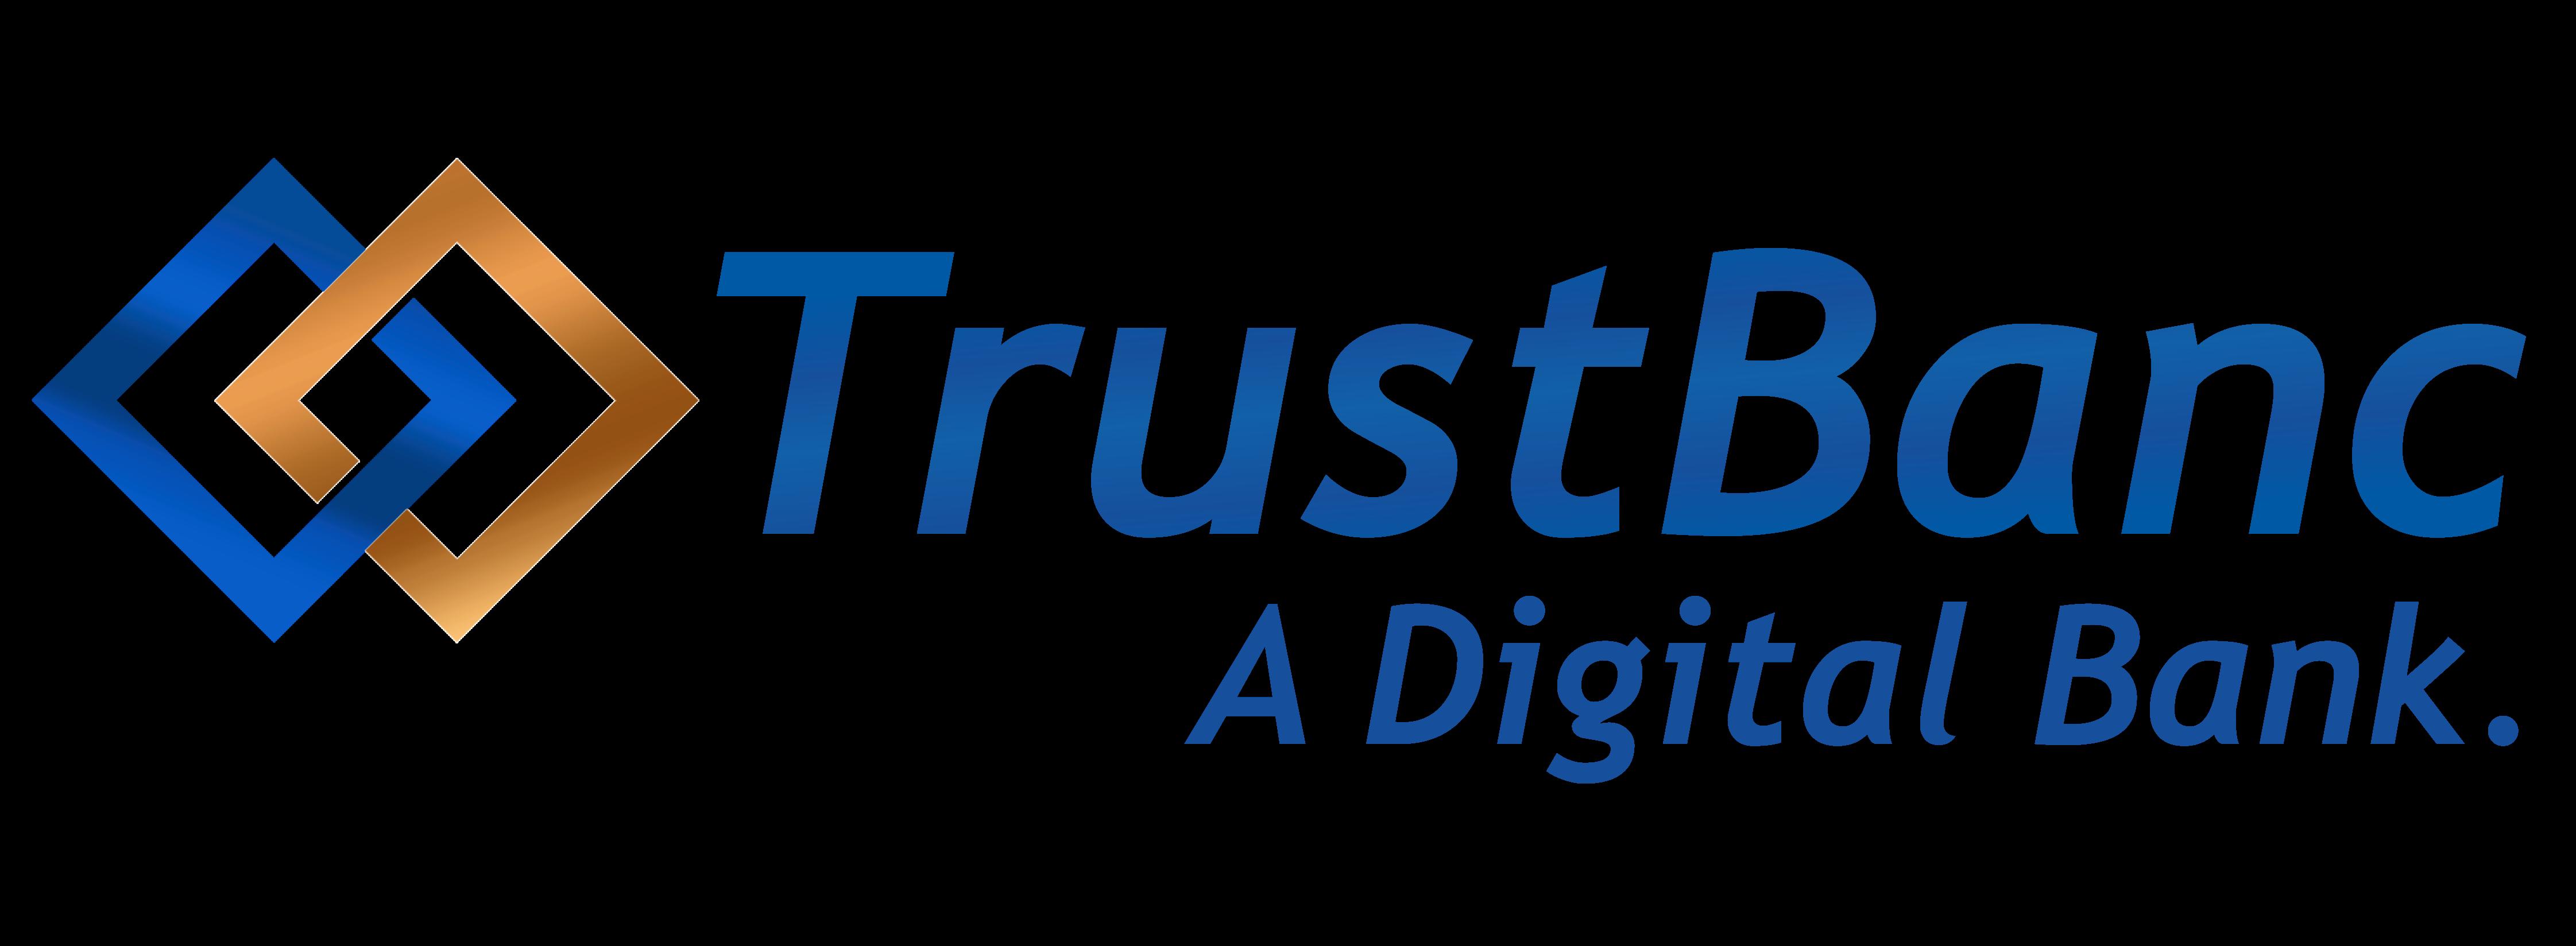 TrustBanc Financial Group